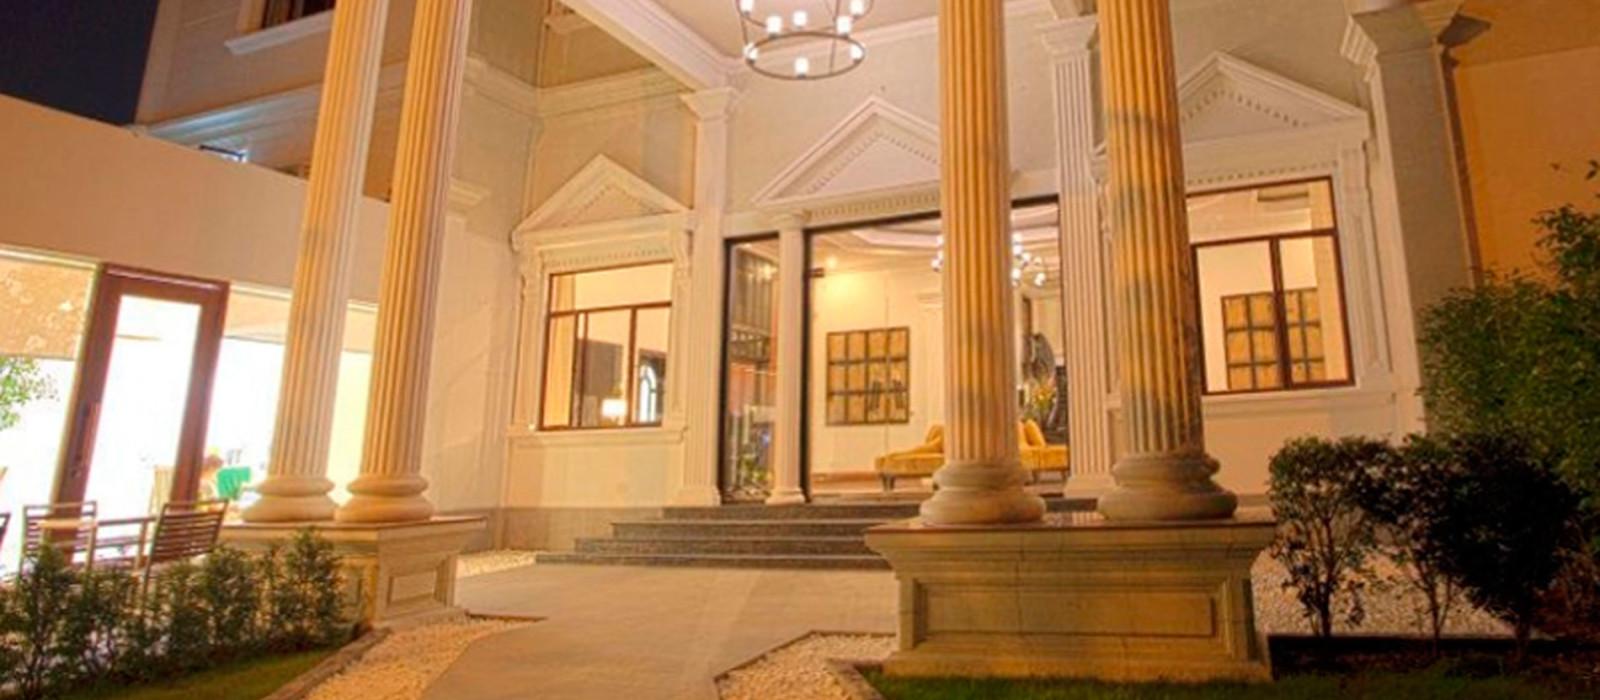 Hotel White Mansion Boutique  Kambodscha